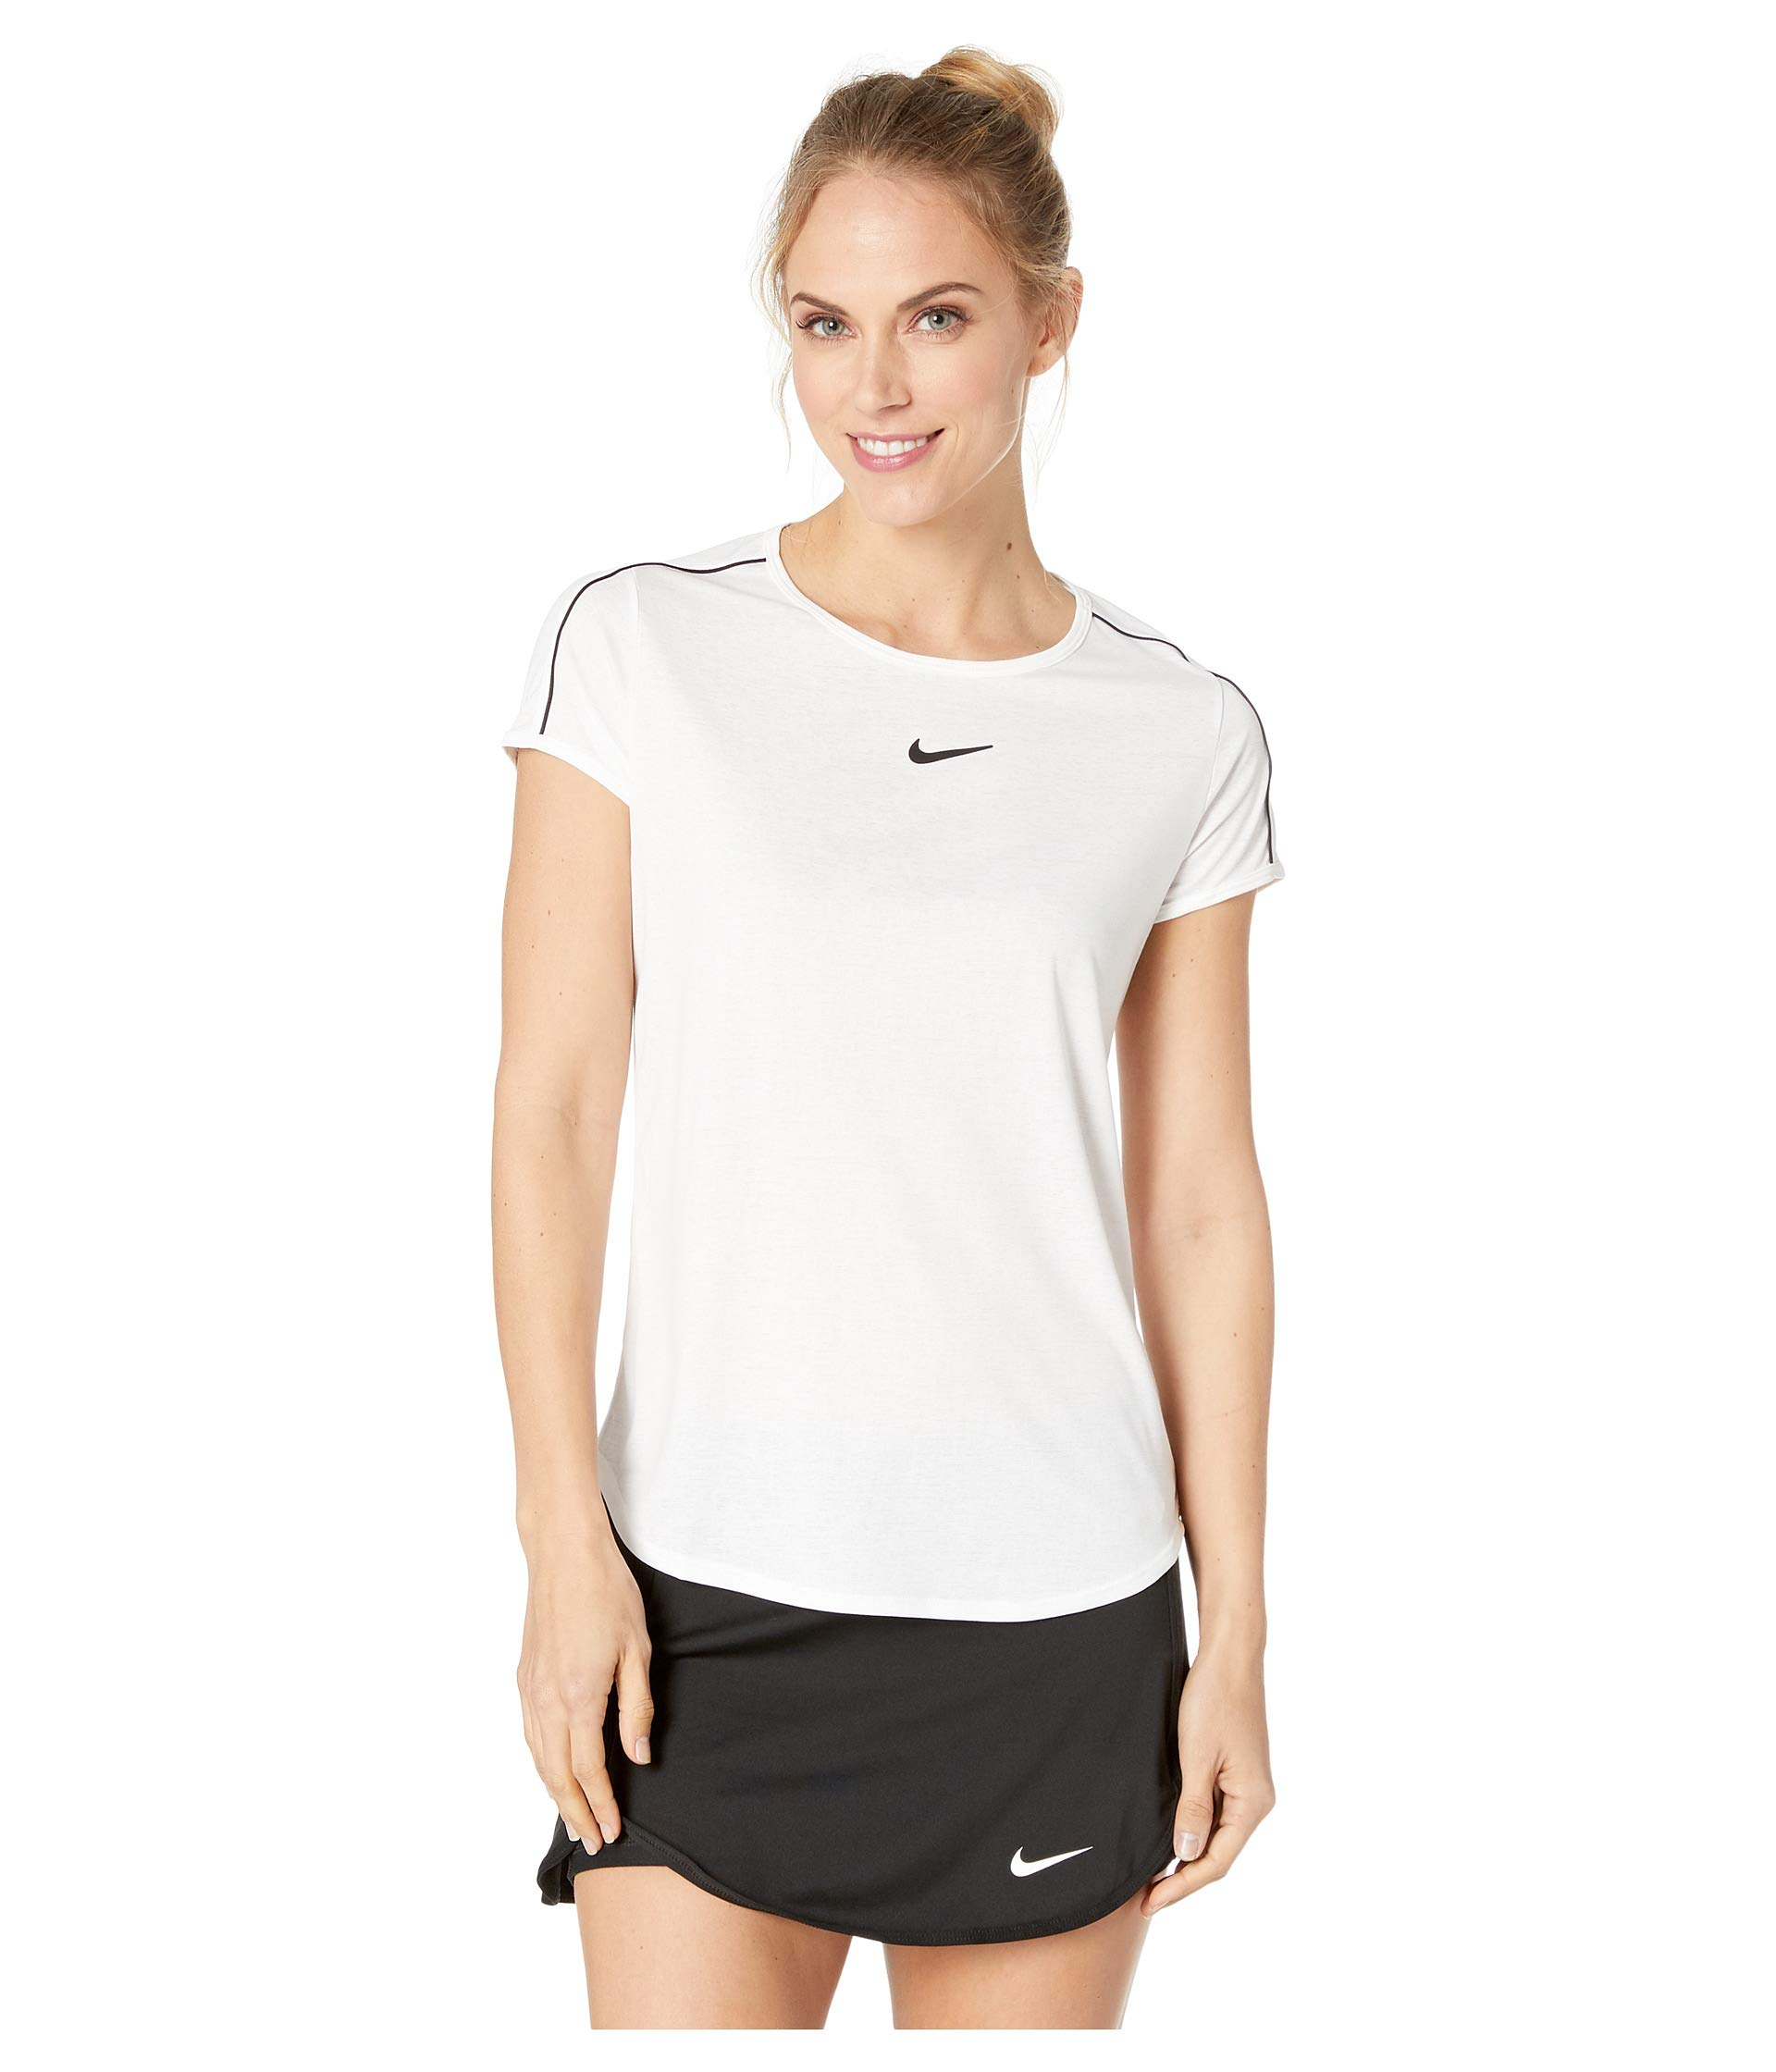 black black White white Nike Court Top Dry qXUB1w